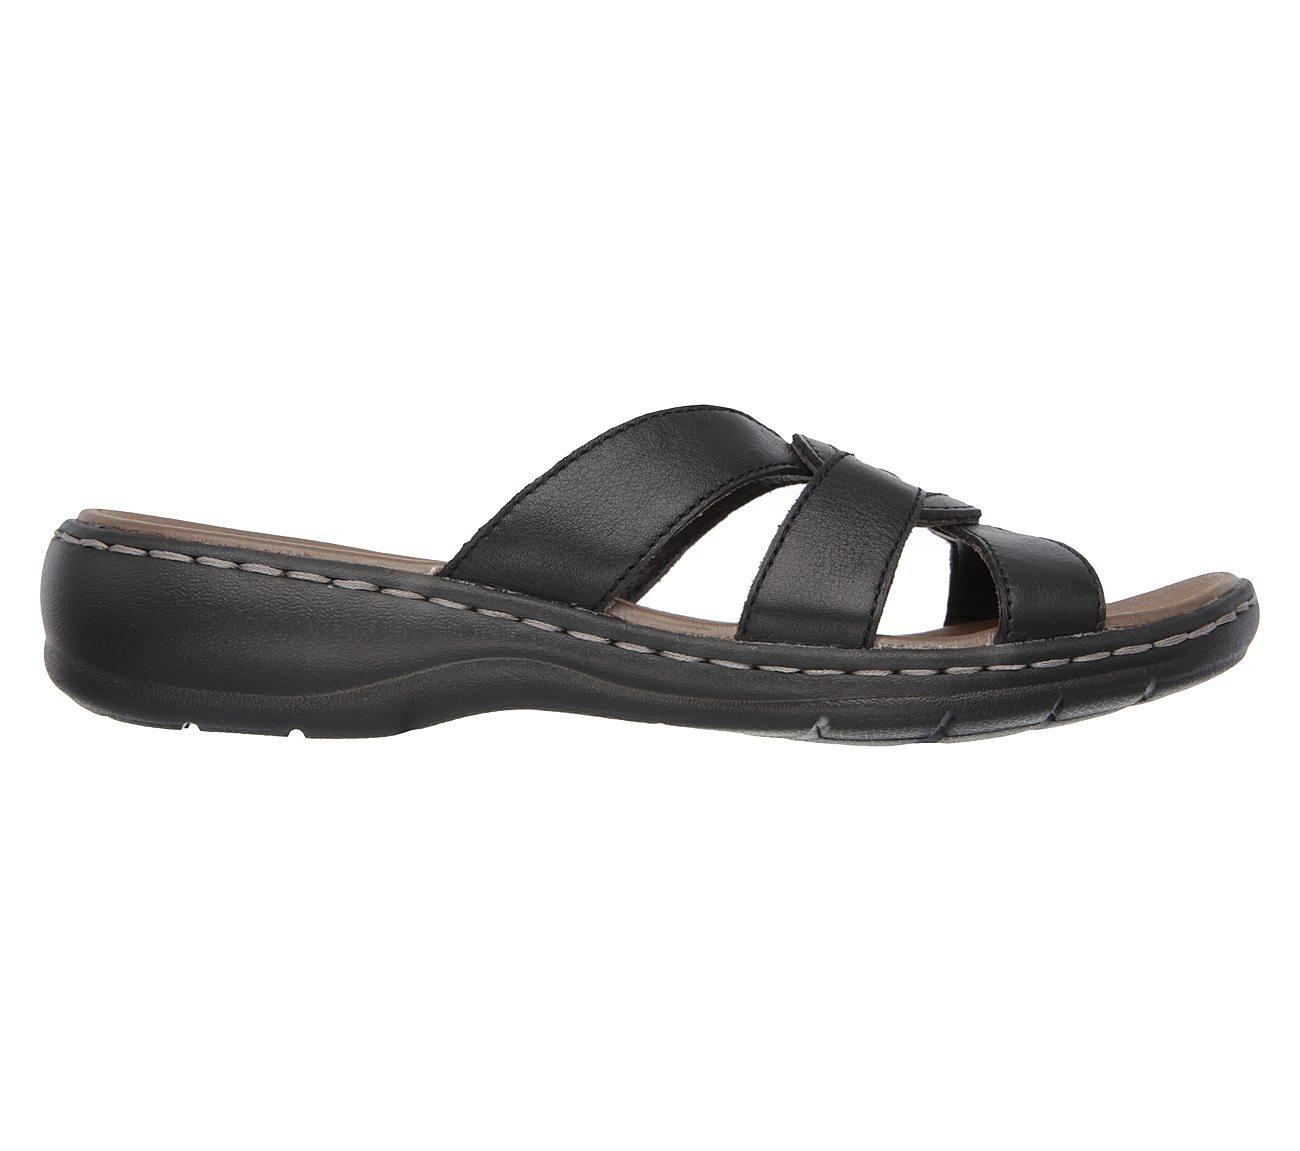 d8835990f37 Buy SKECHERS Passenger - Getaway Cali Shoes only $42.00